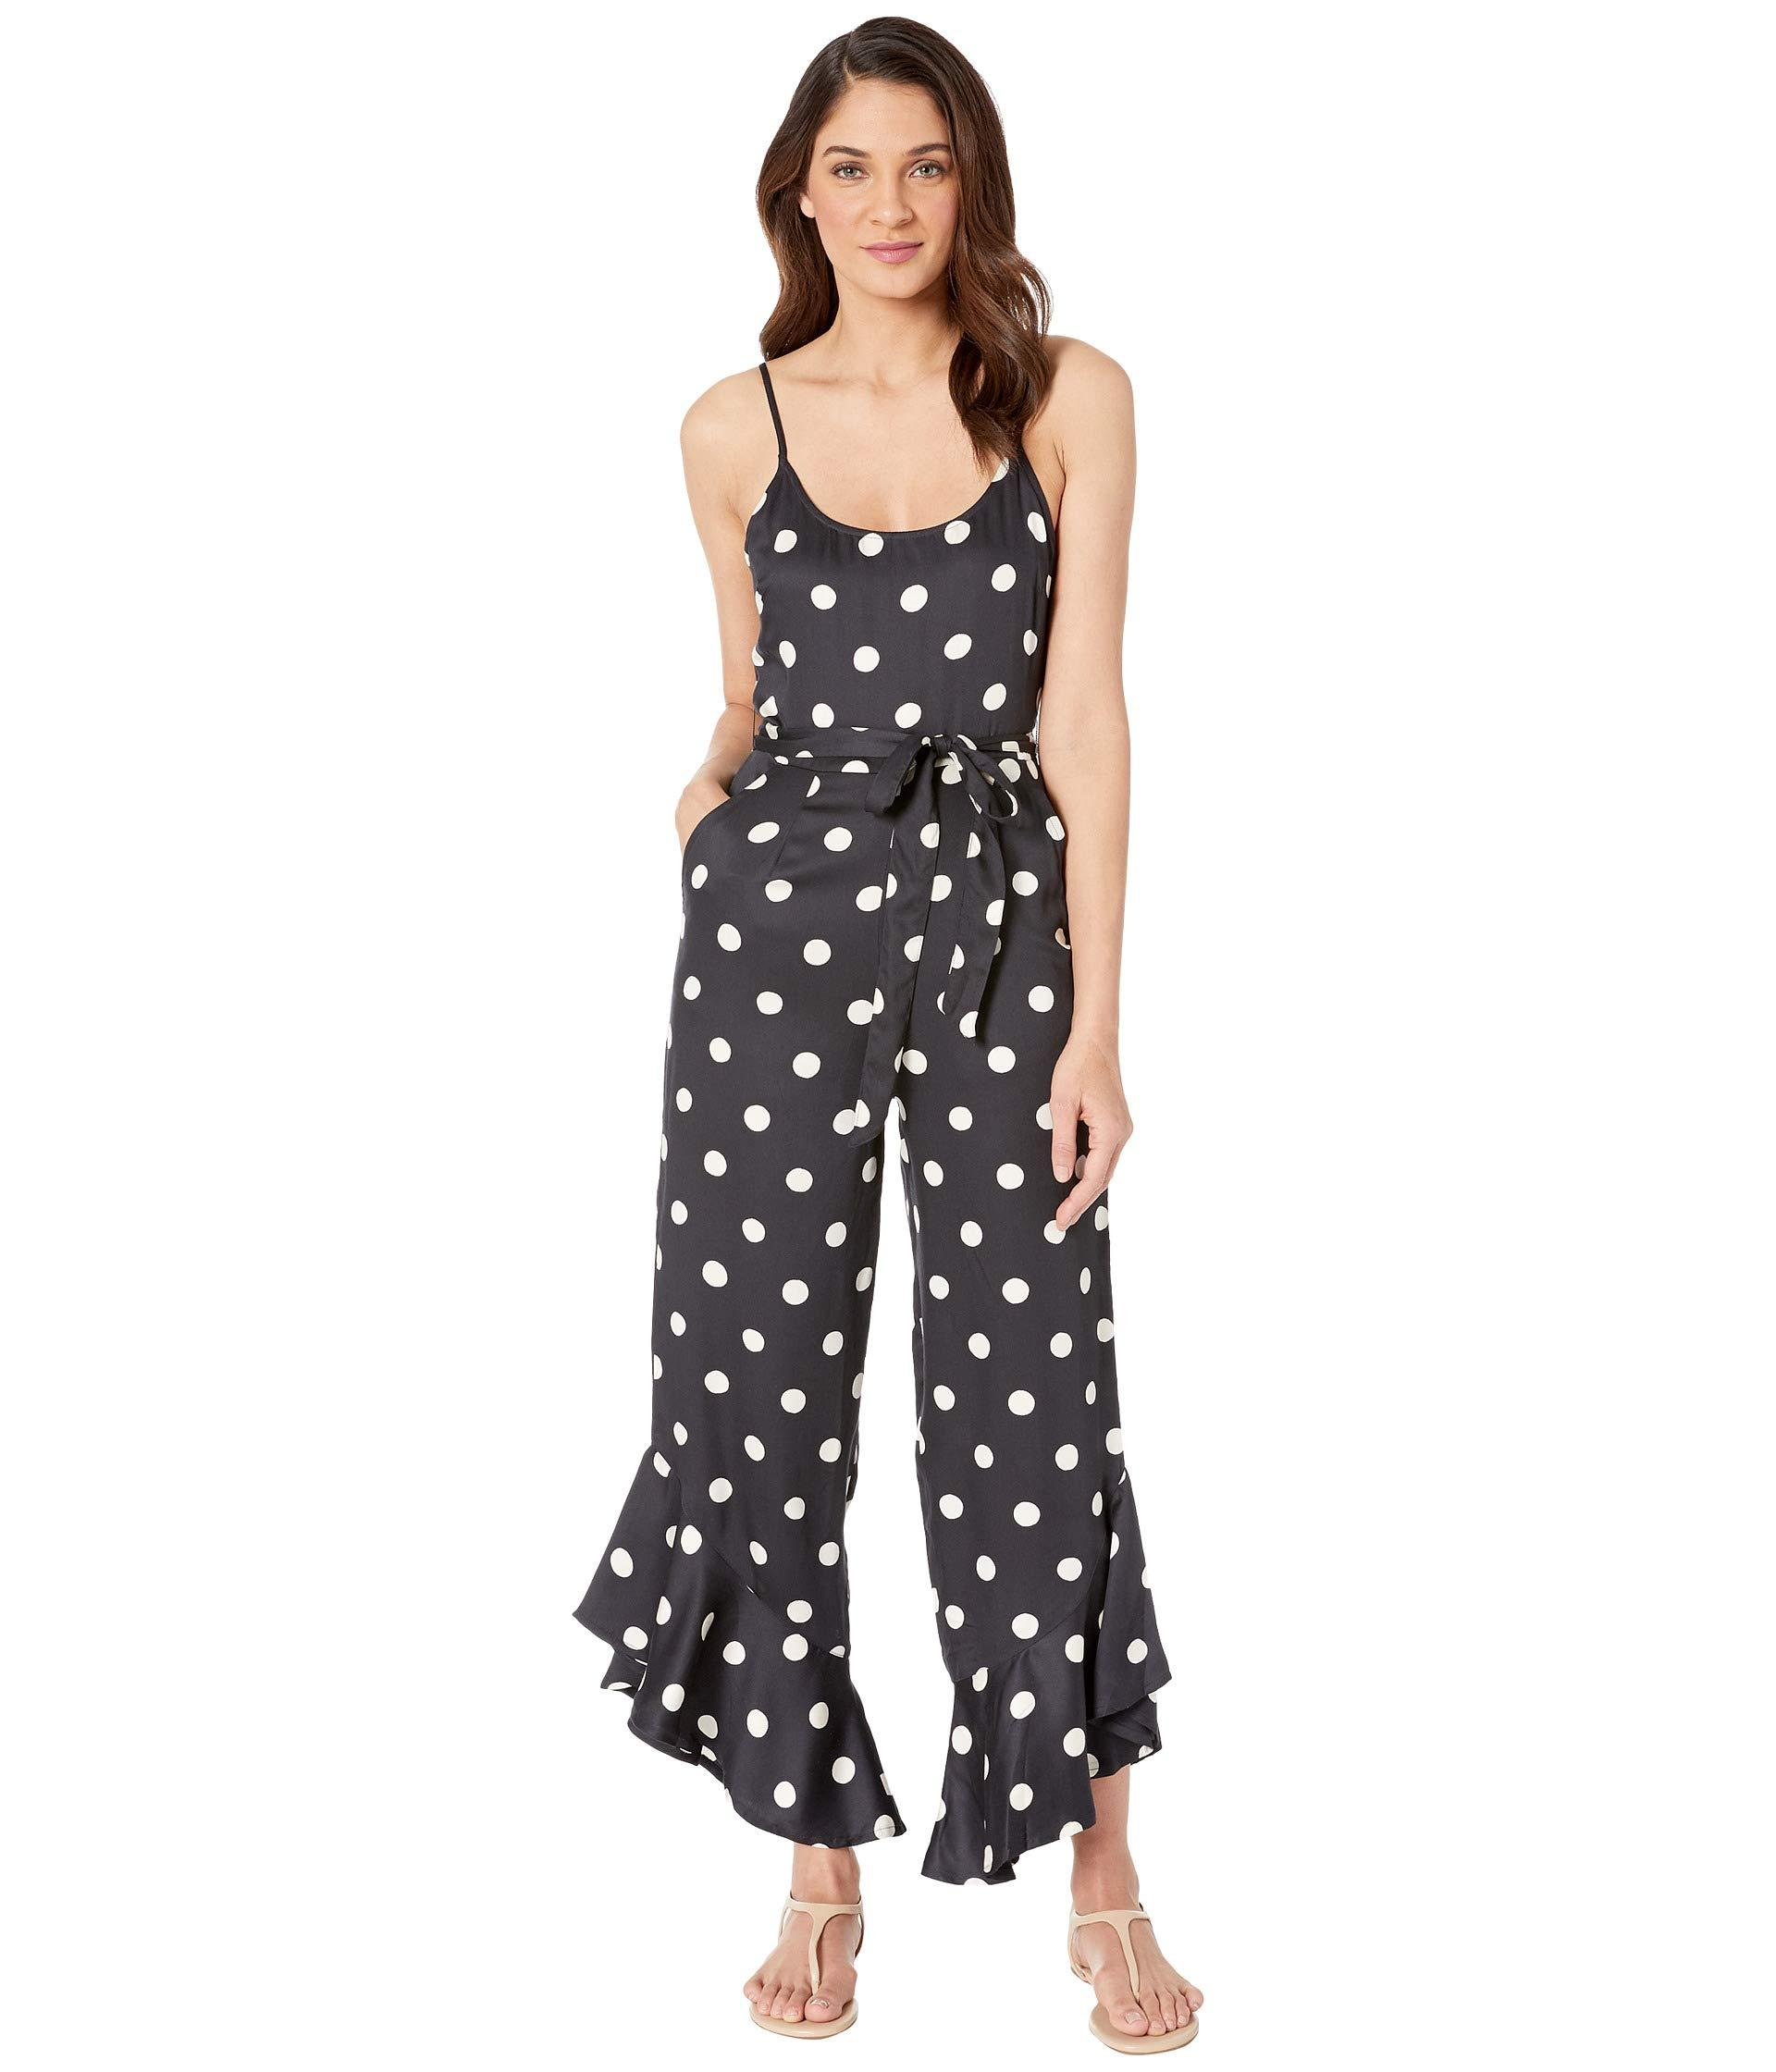 597693298952 Lyst - Billabong Jump In Polka Dot Jumpsuit in Black